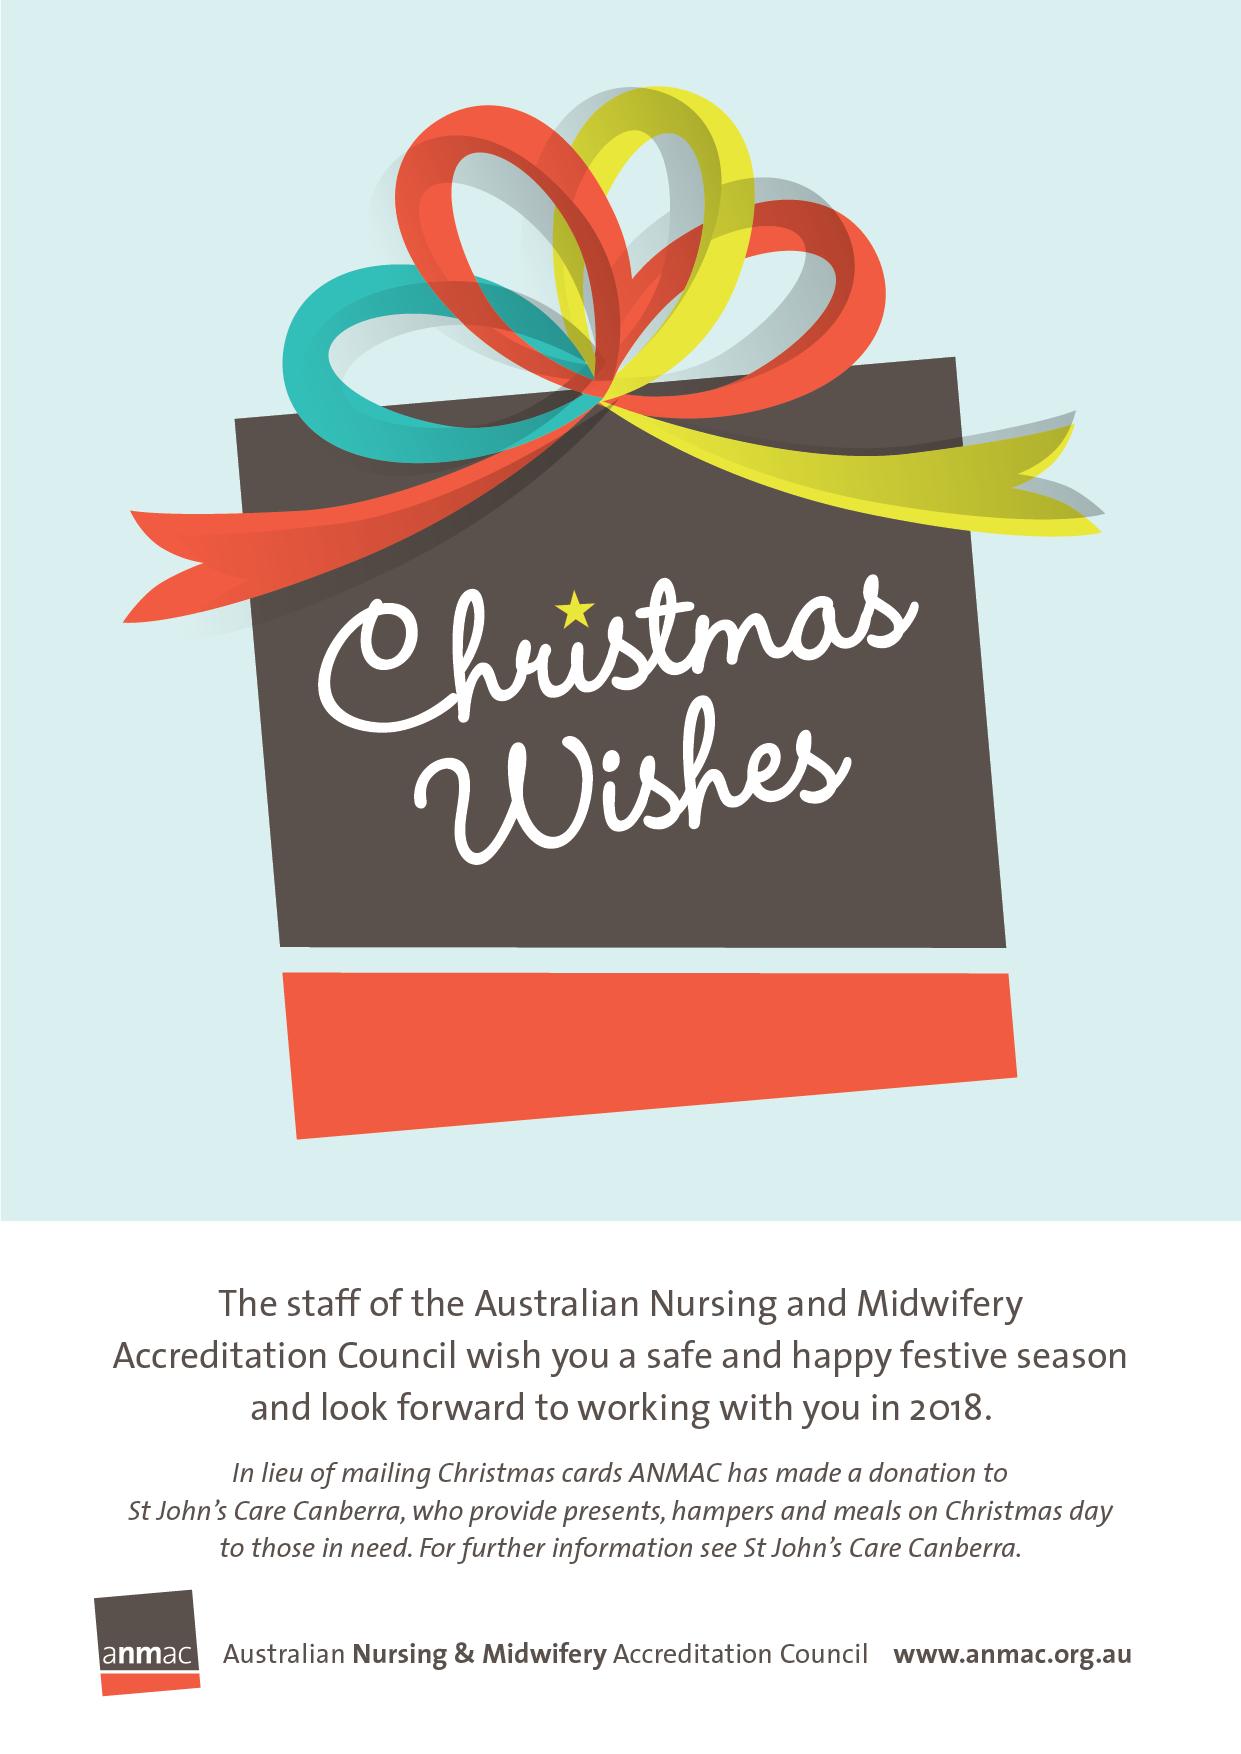 ANMAC Christmas Card | ANMAC | Australian Nursing & Midwifery ...